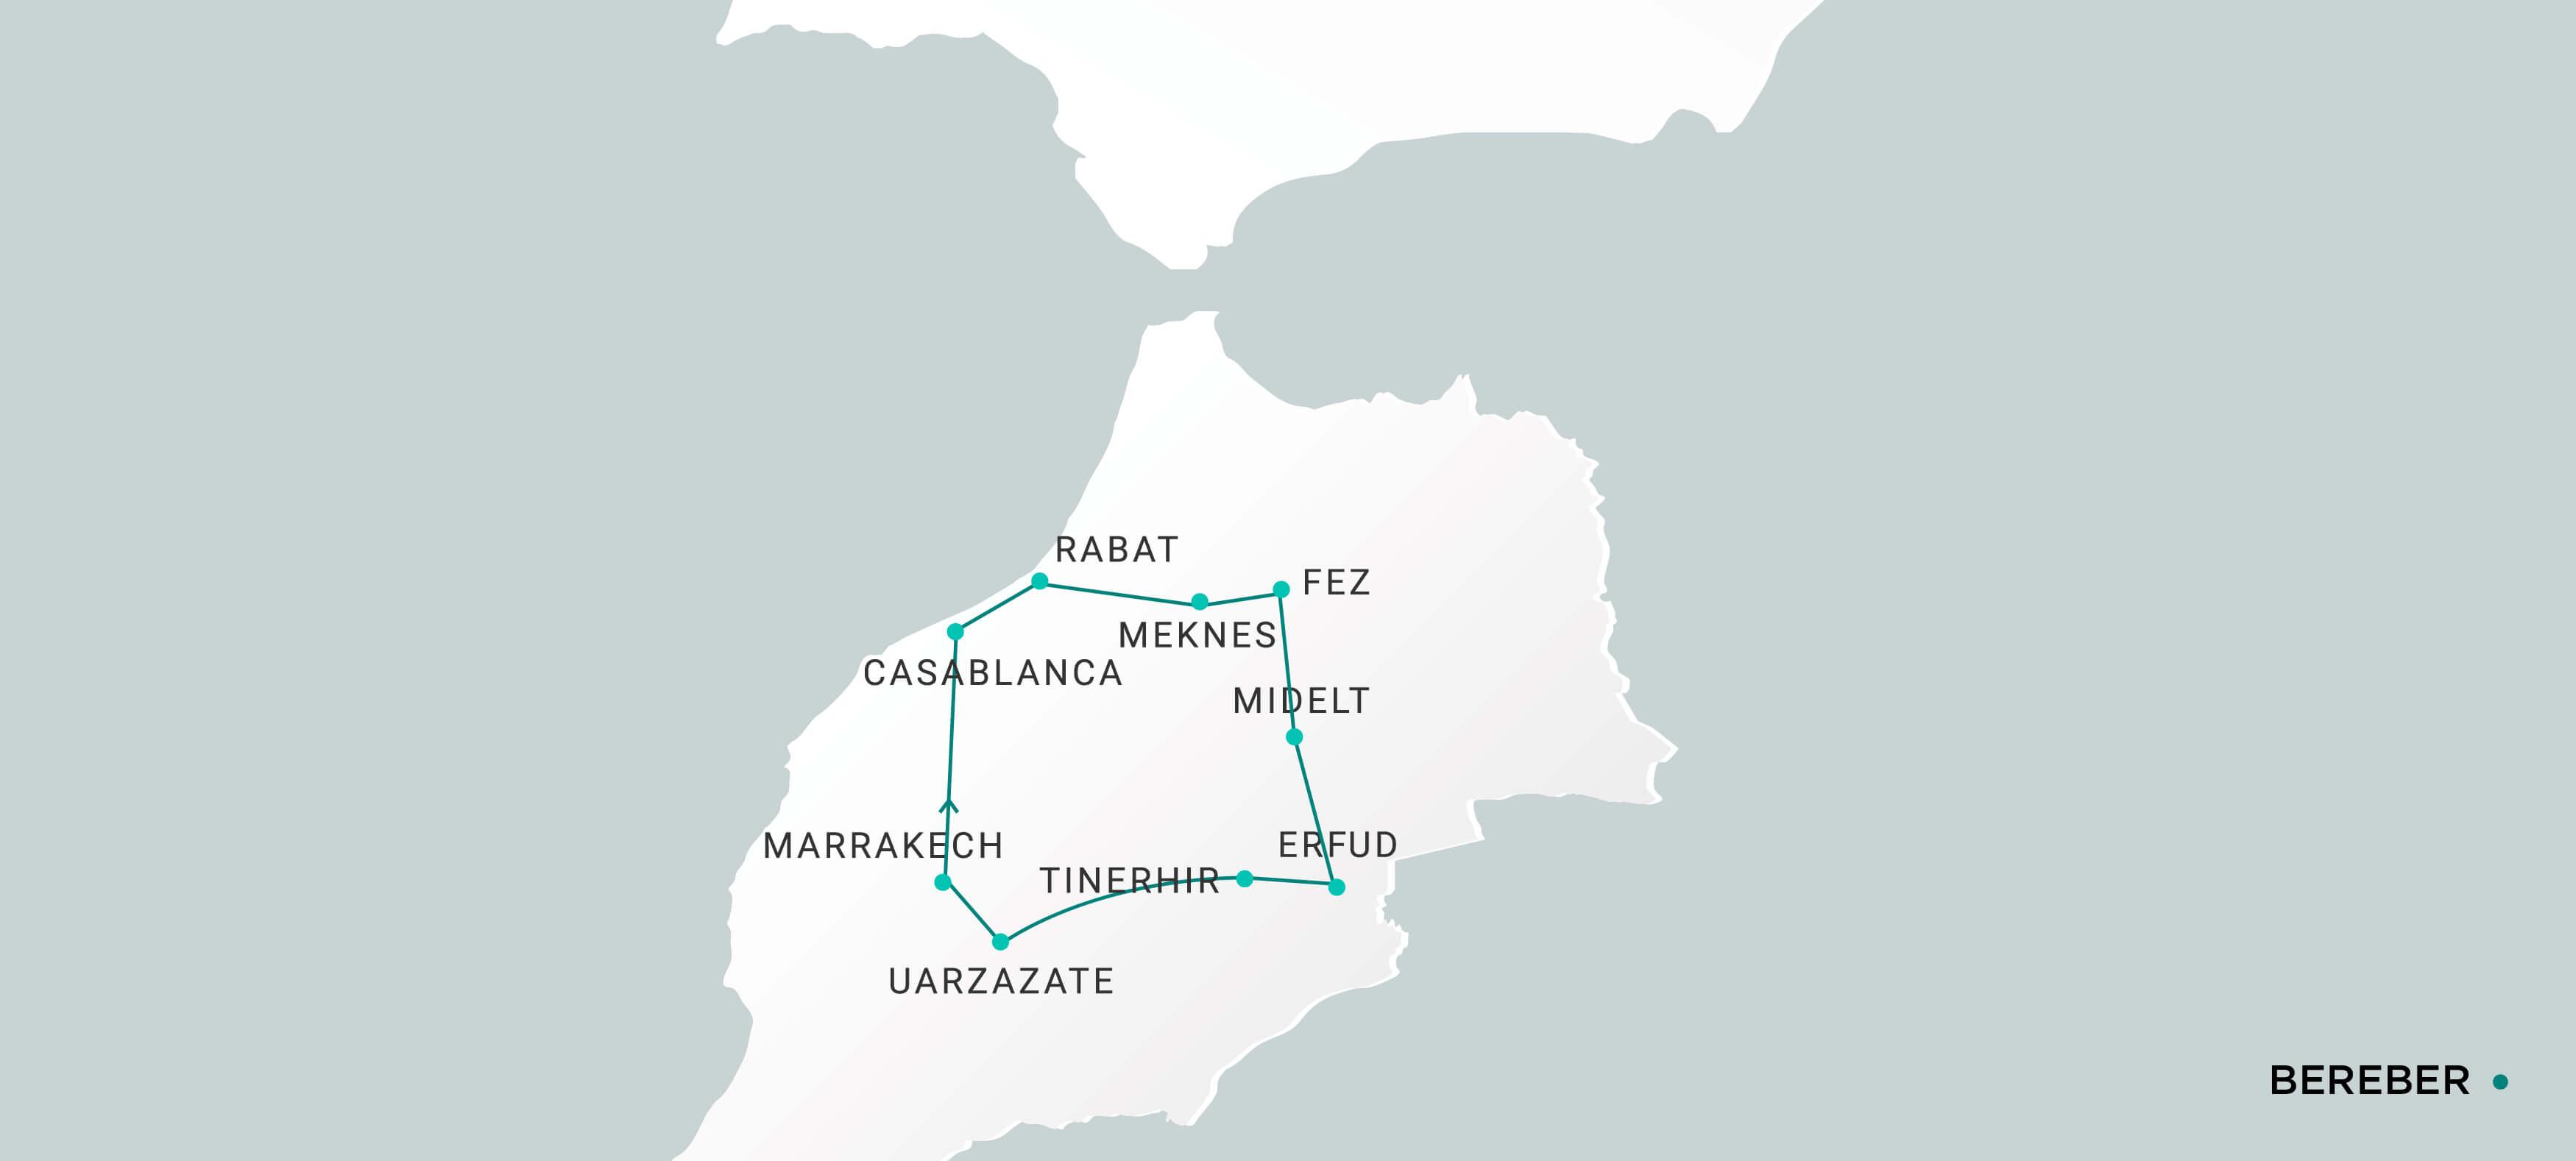 Mapa Bereber